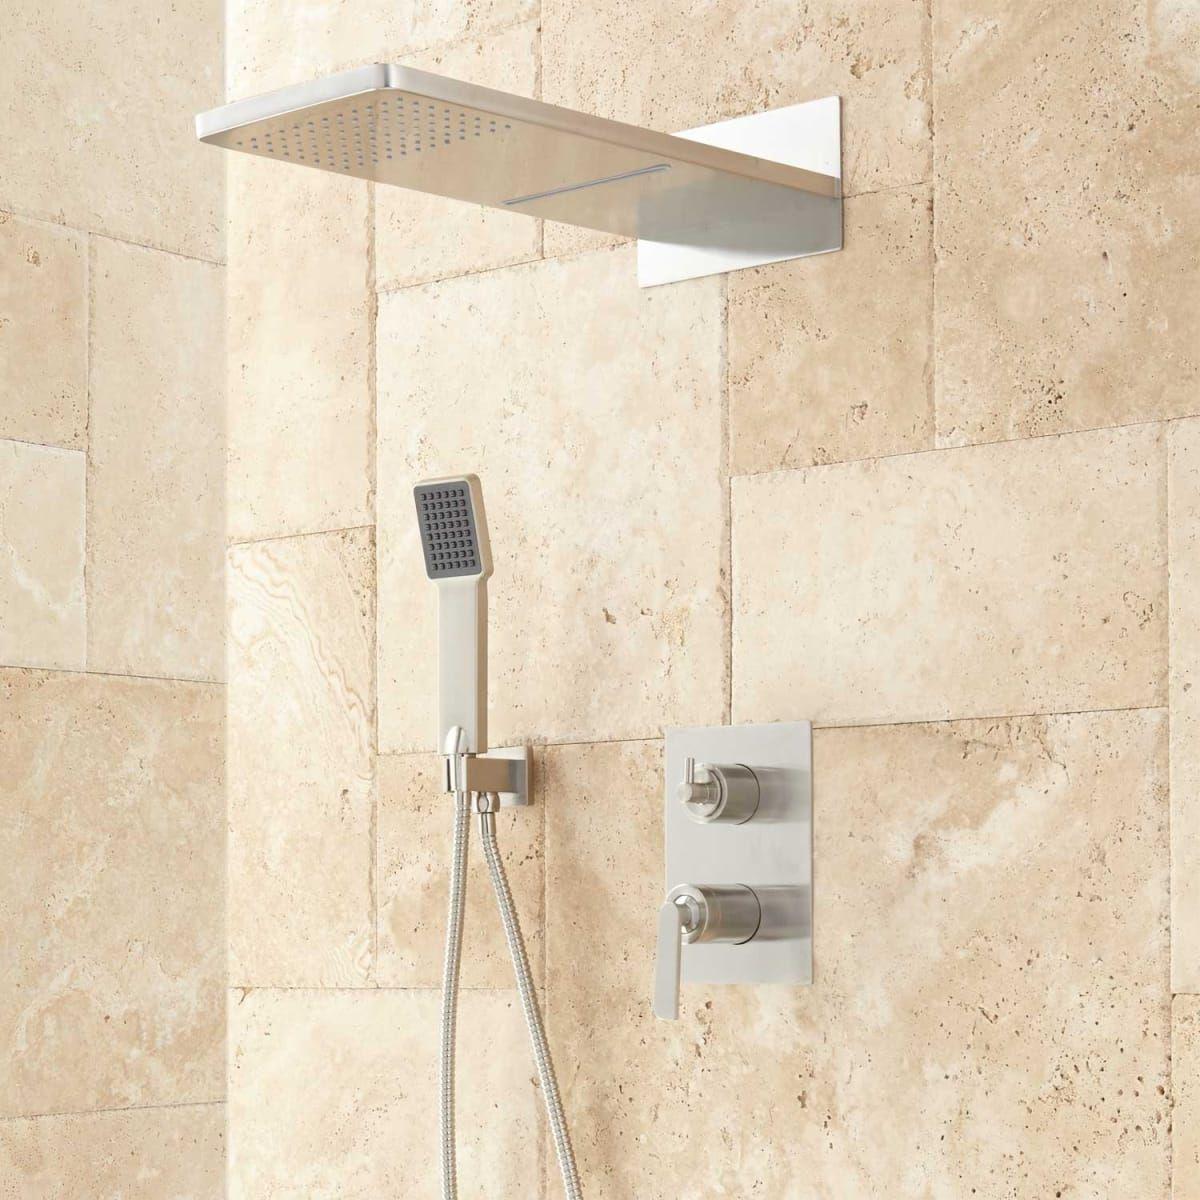 Signature Hardware 927746 Shower Systems Shower Panels